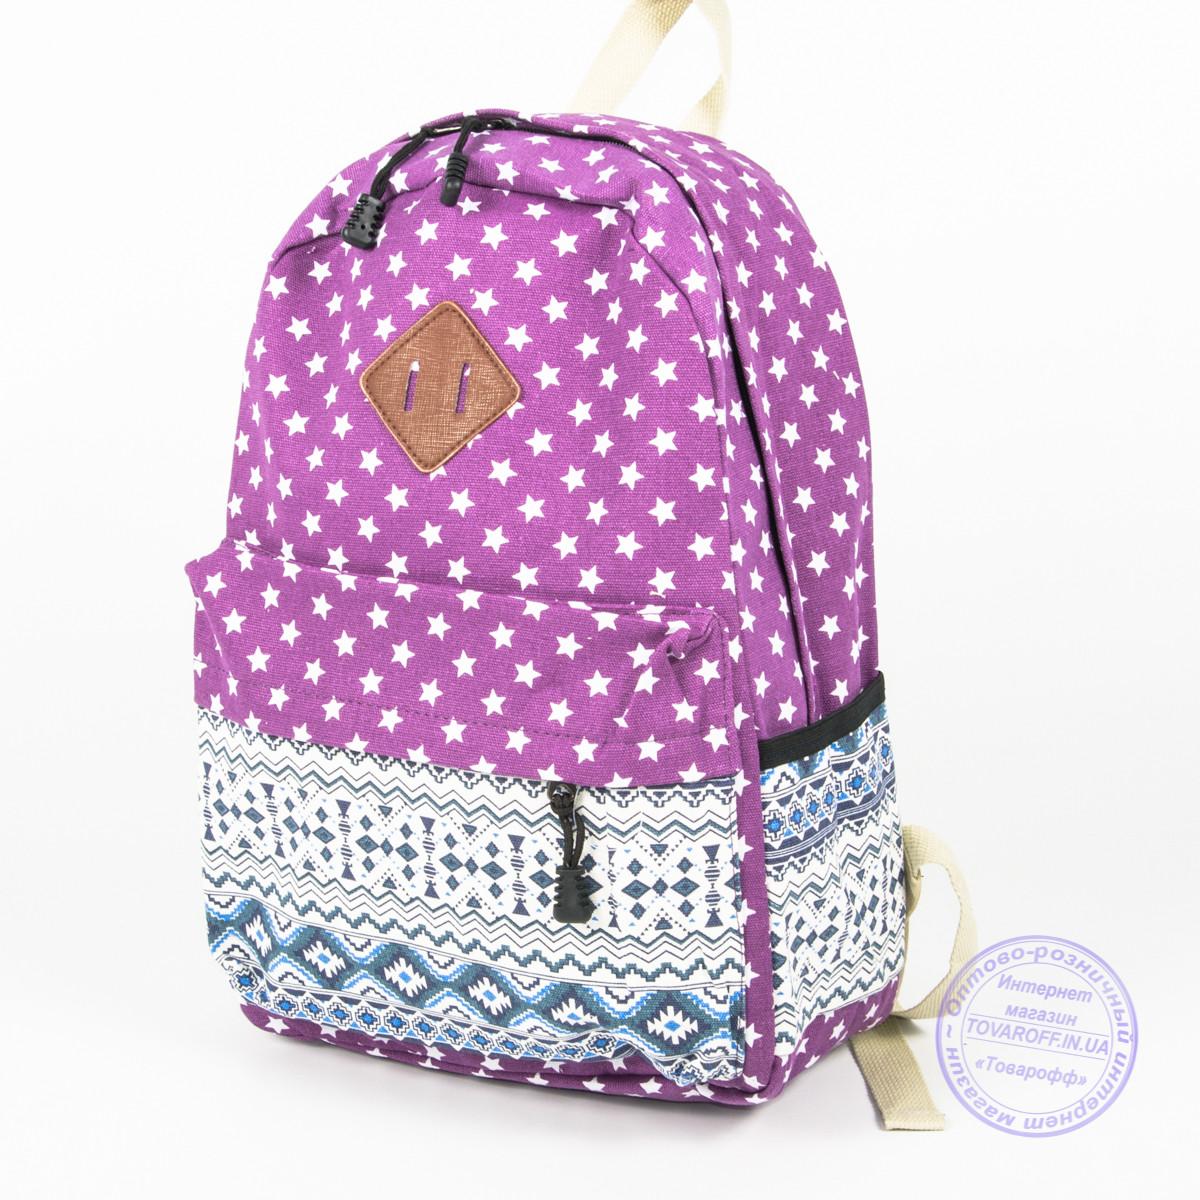 Рюкзак в звездочку рюкзак для отдыха за границей